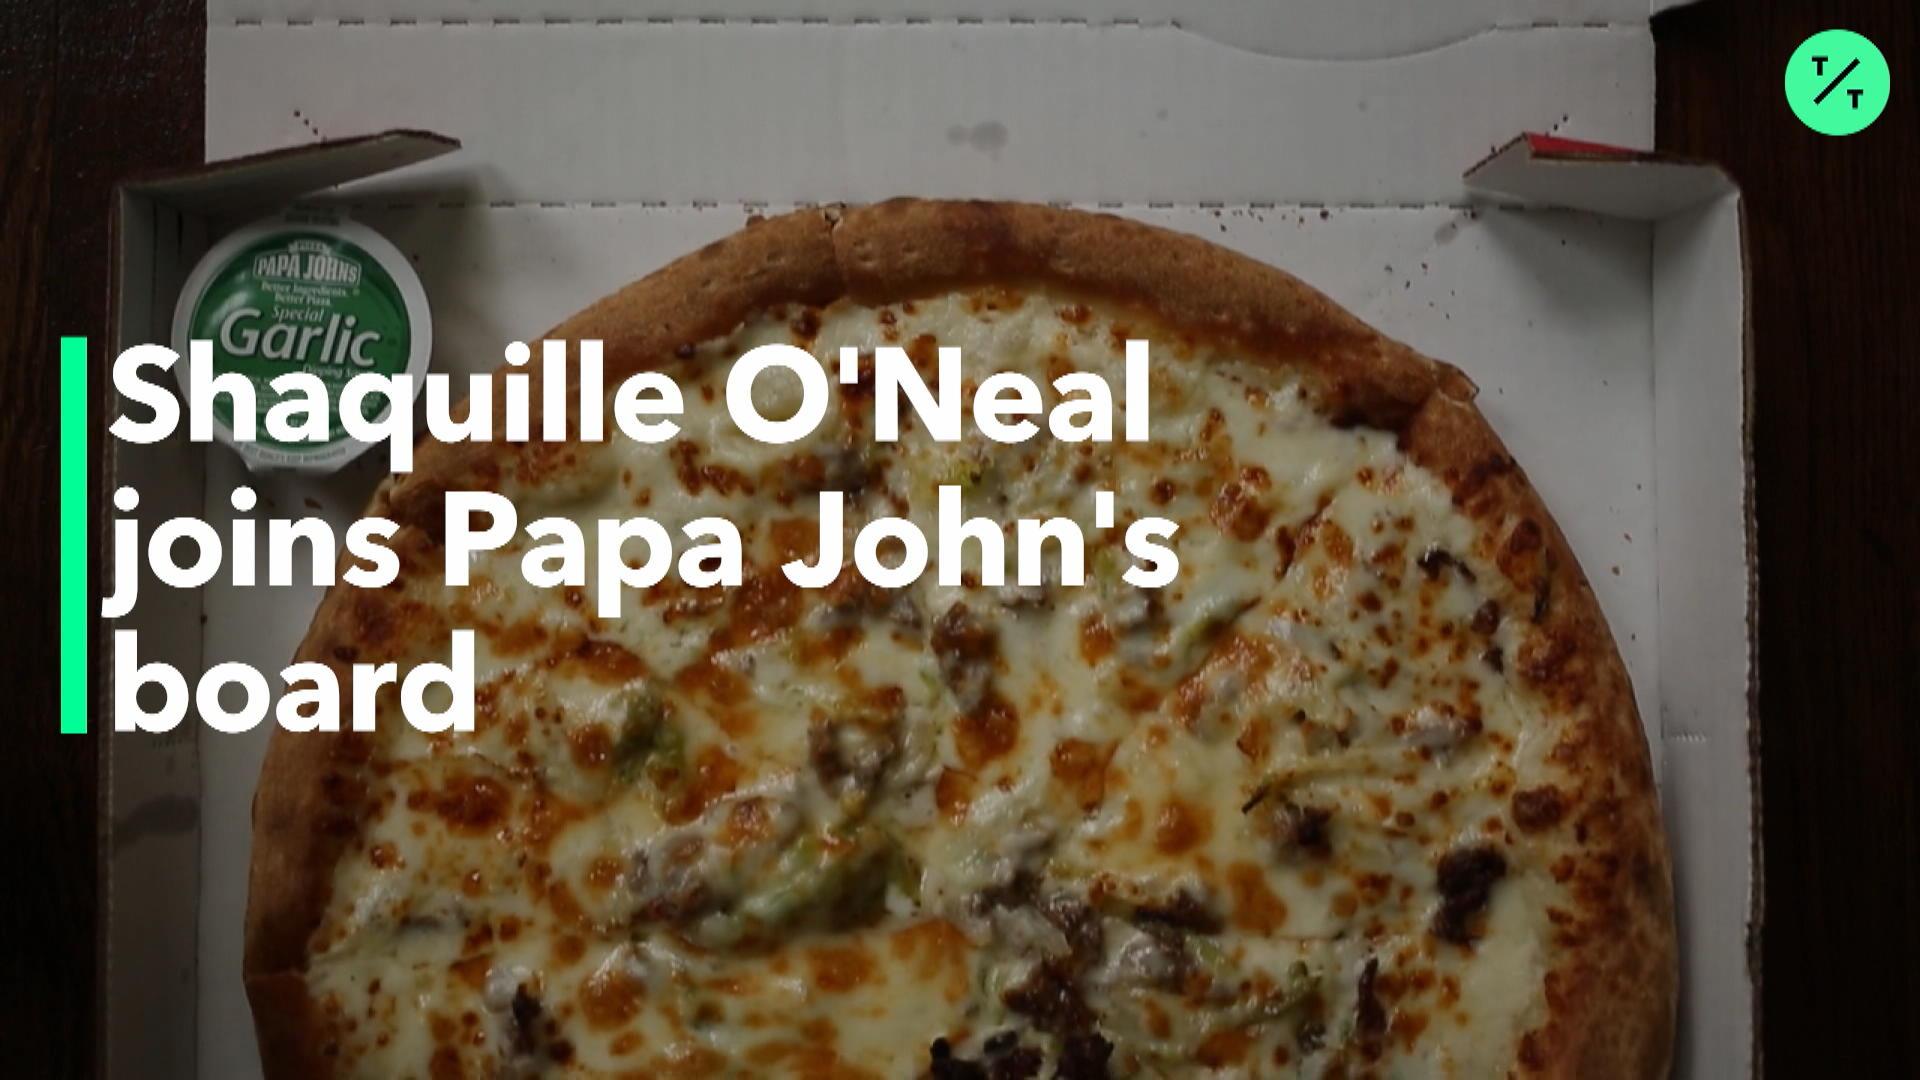 Shaquille O'Neal Joins Papa John's Board